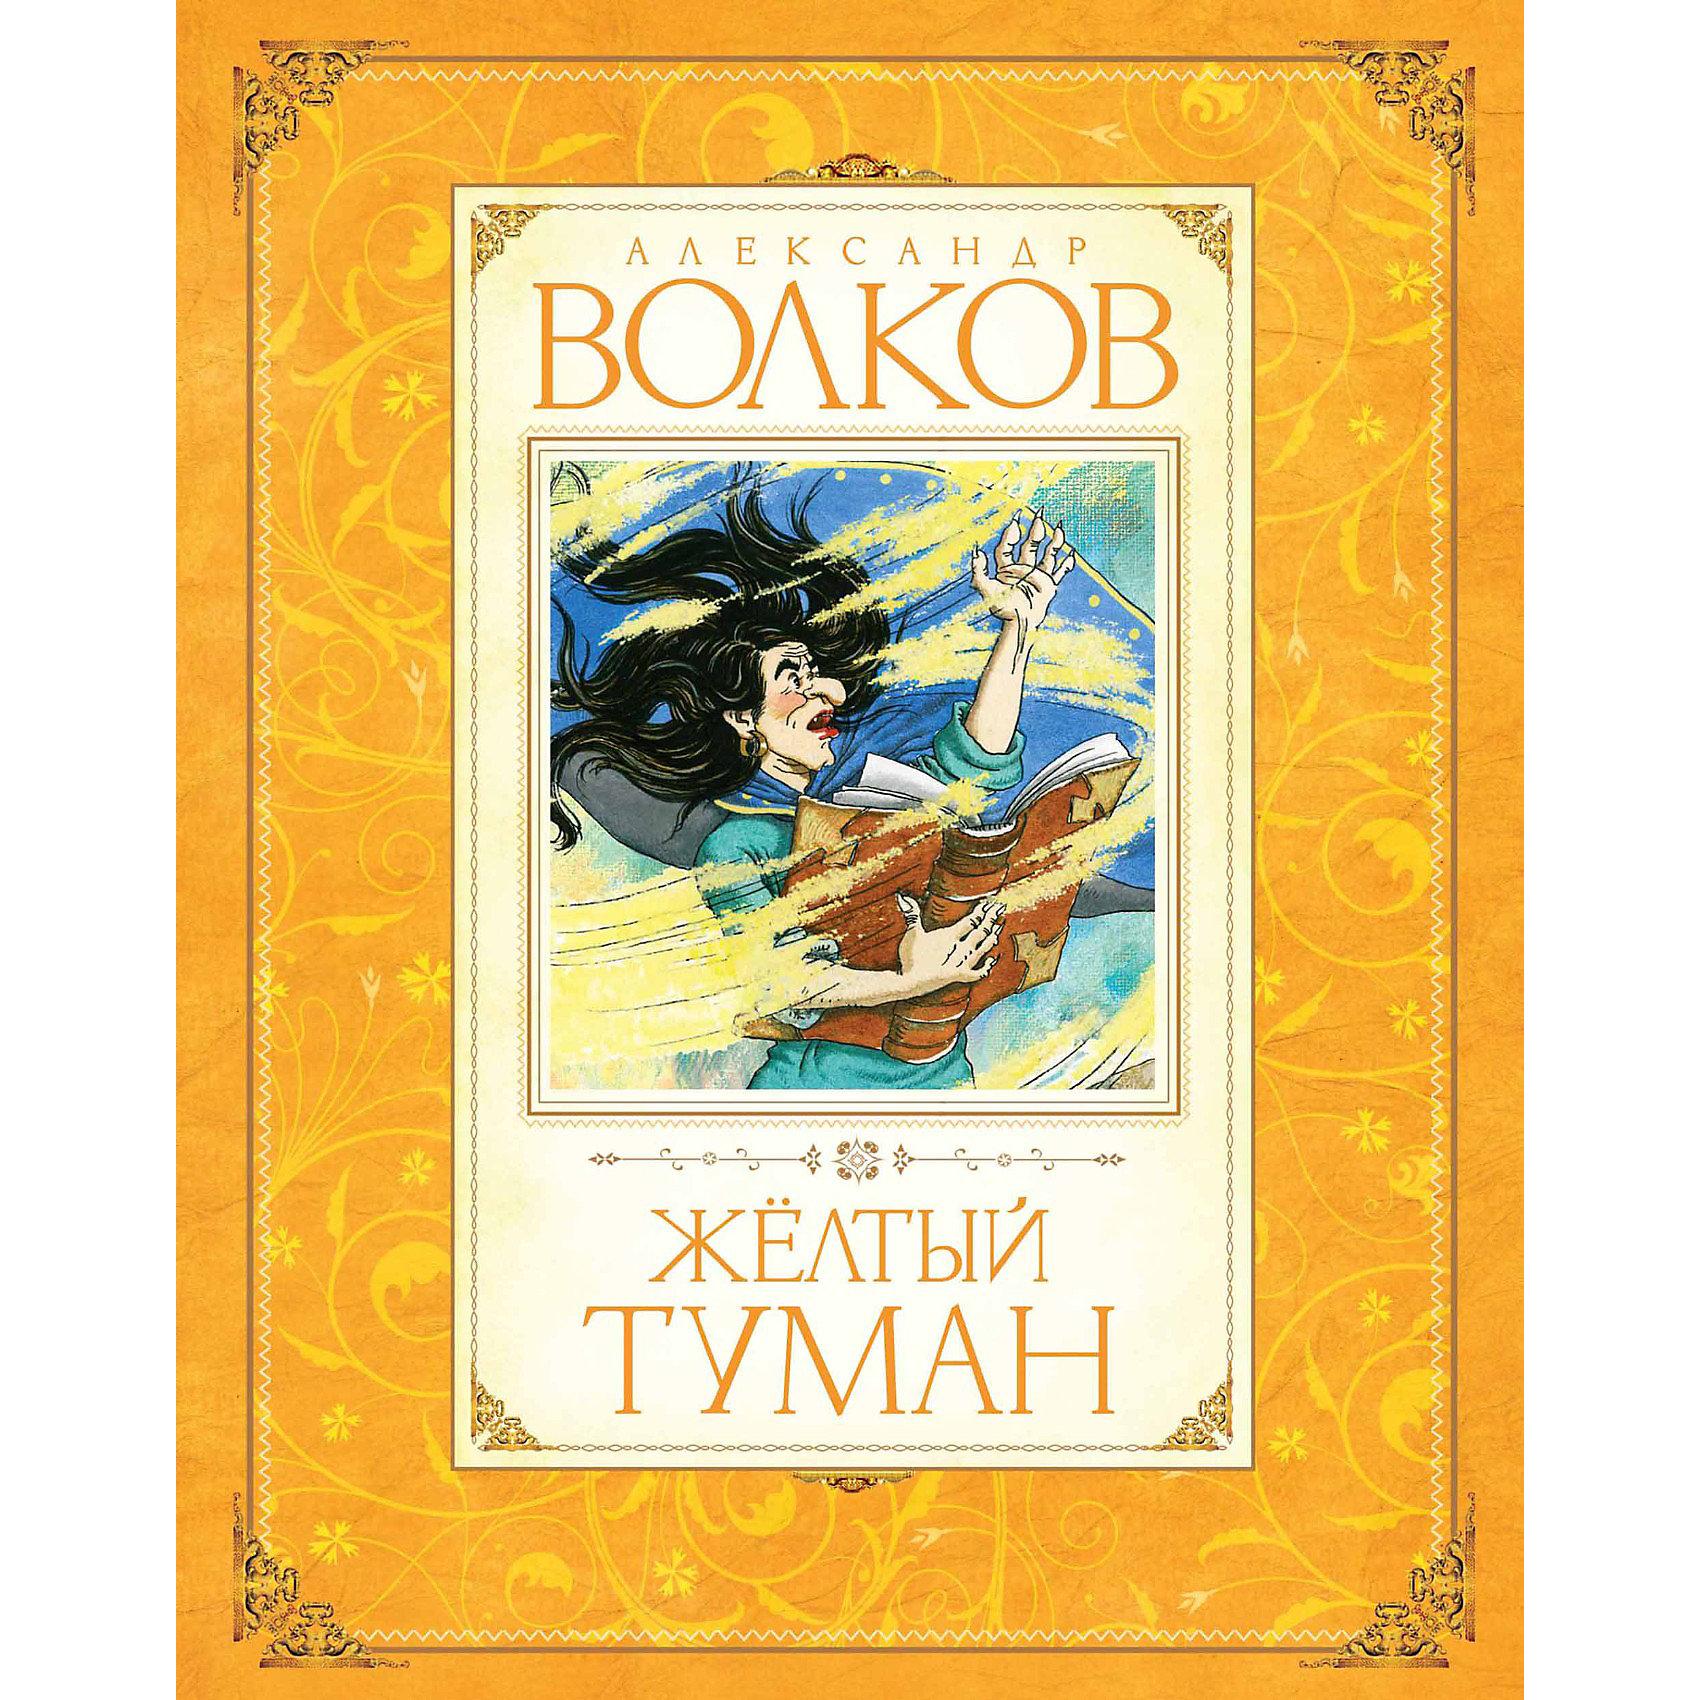 Махаон Желтый туман, А.М. Волков